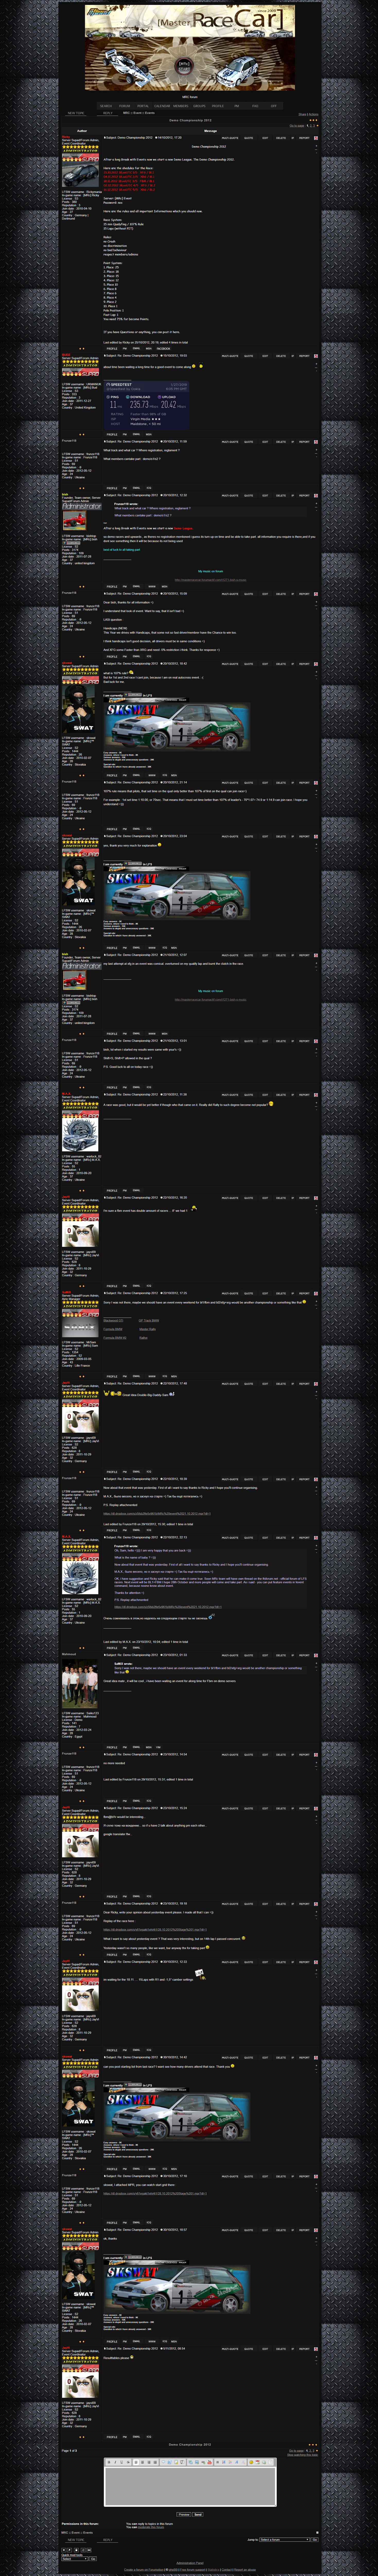 [Image: screencapture-masterracecar-forumactif-t...page-1.jpg]